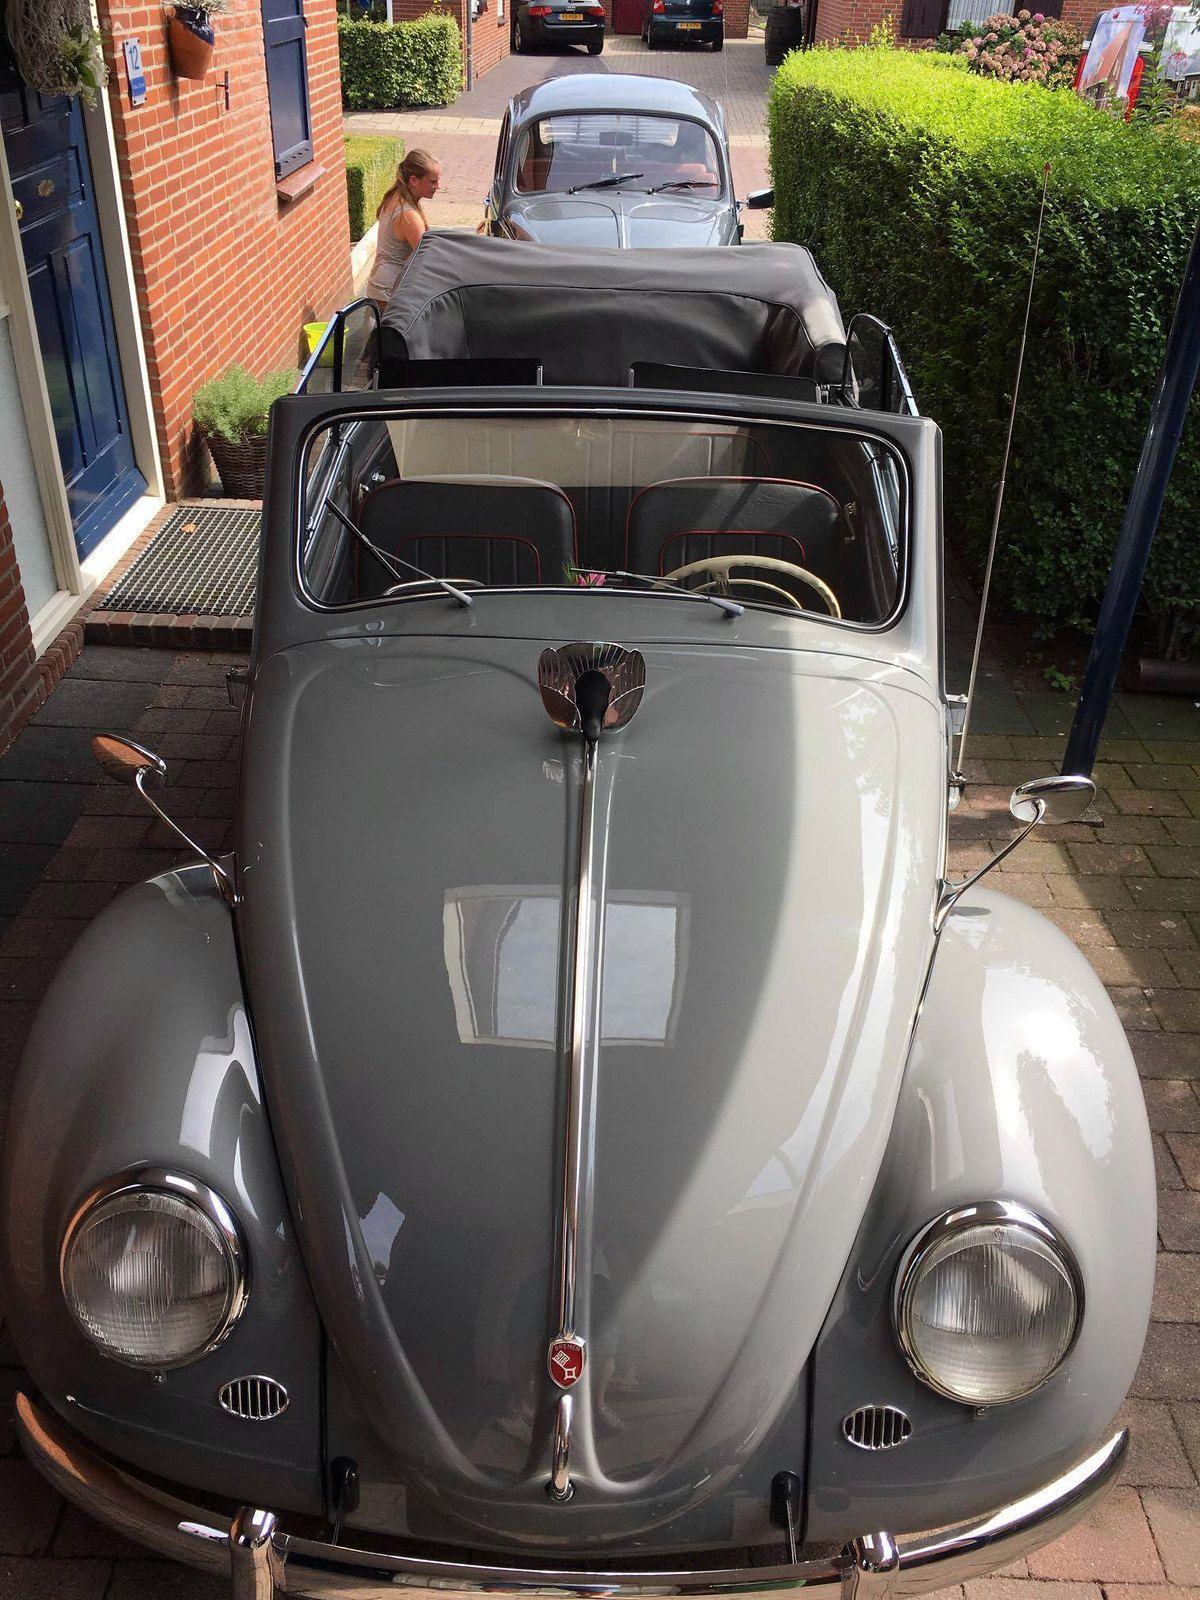 Hendrik Jan Hofman Vw Beetle Convertible Vw Beetle Classic Vw Kafer